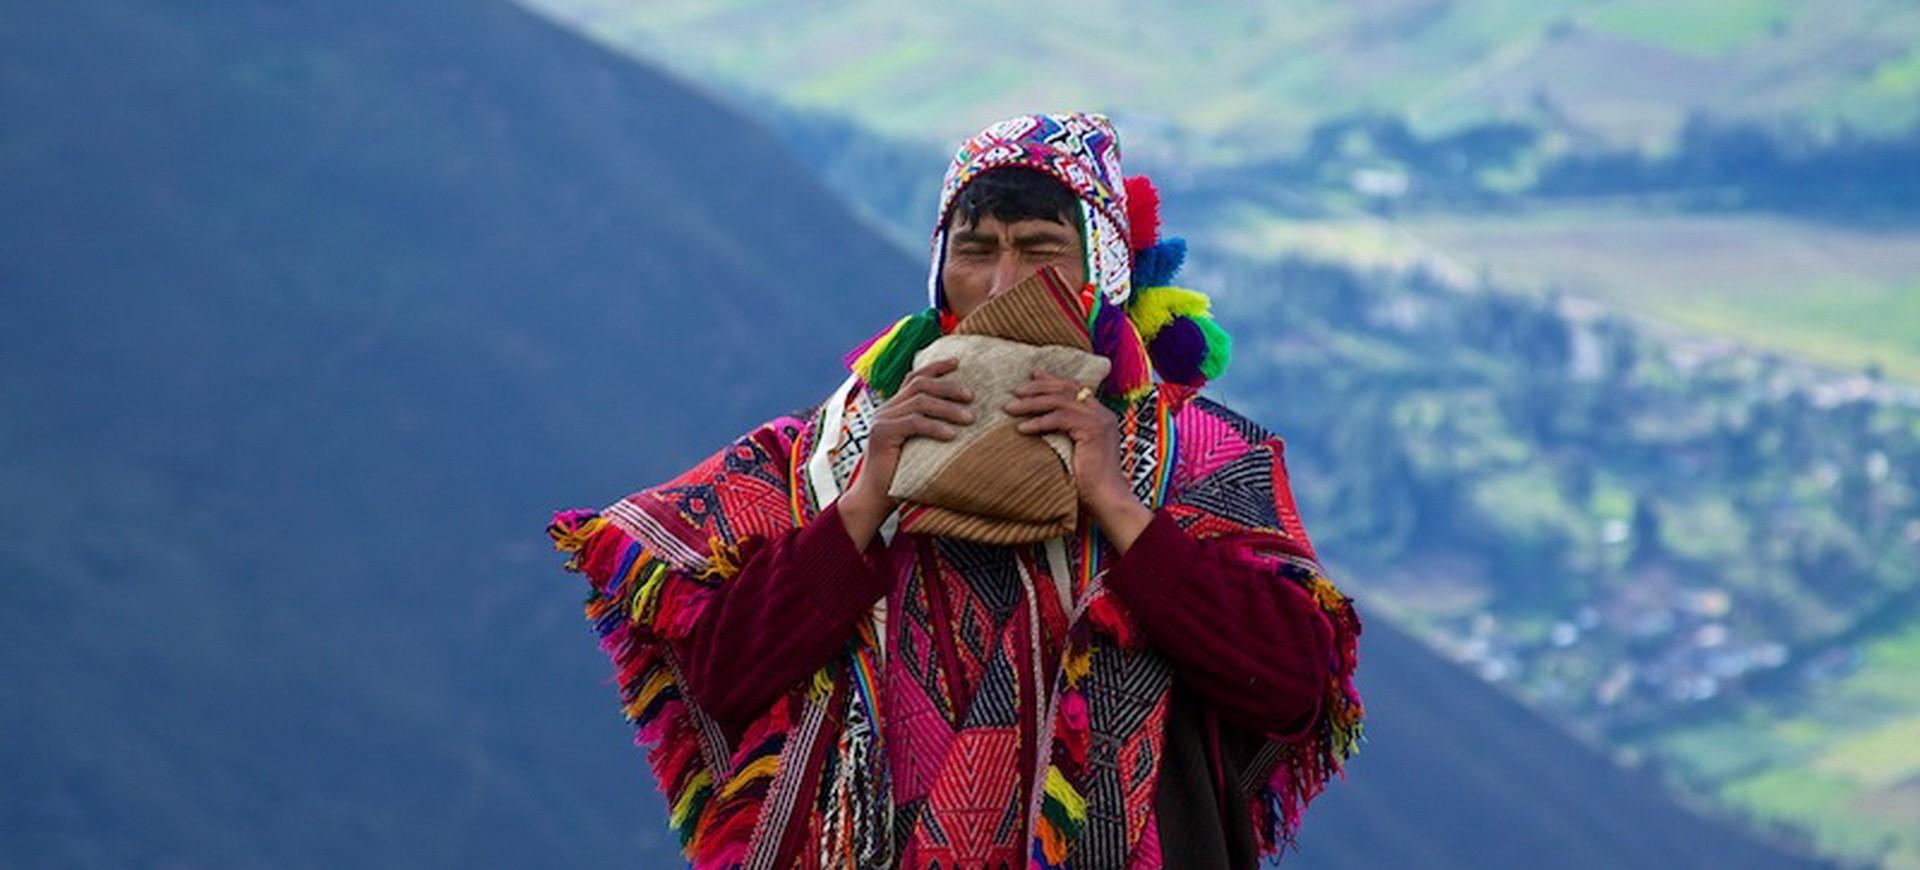 Bolivie un artisan local